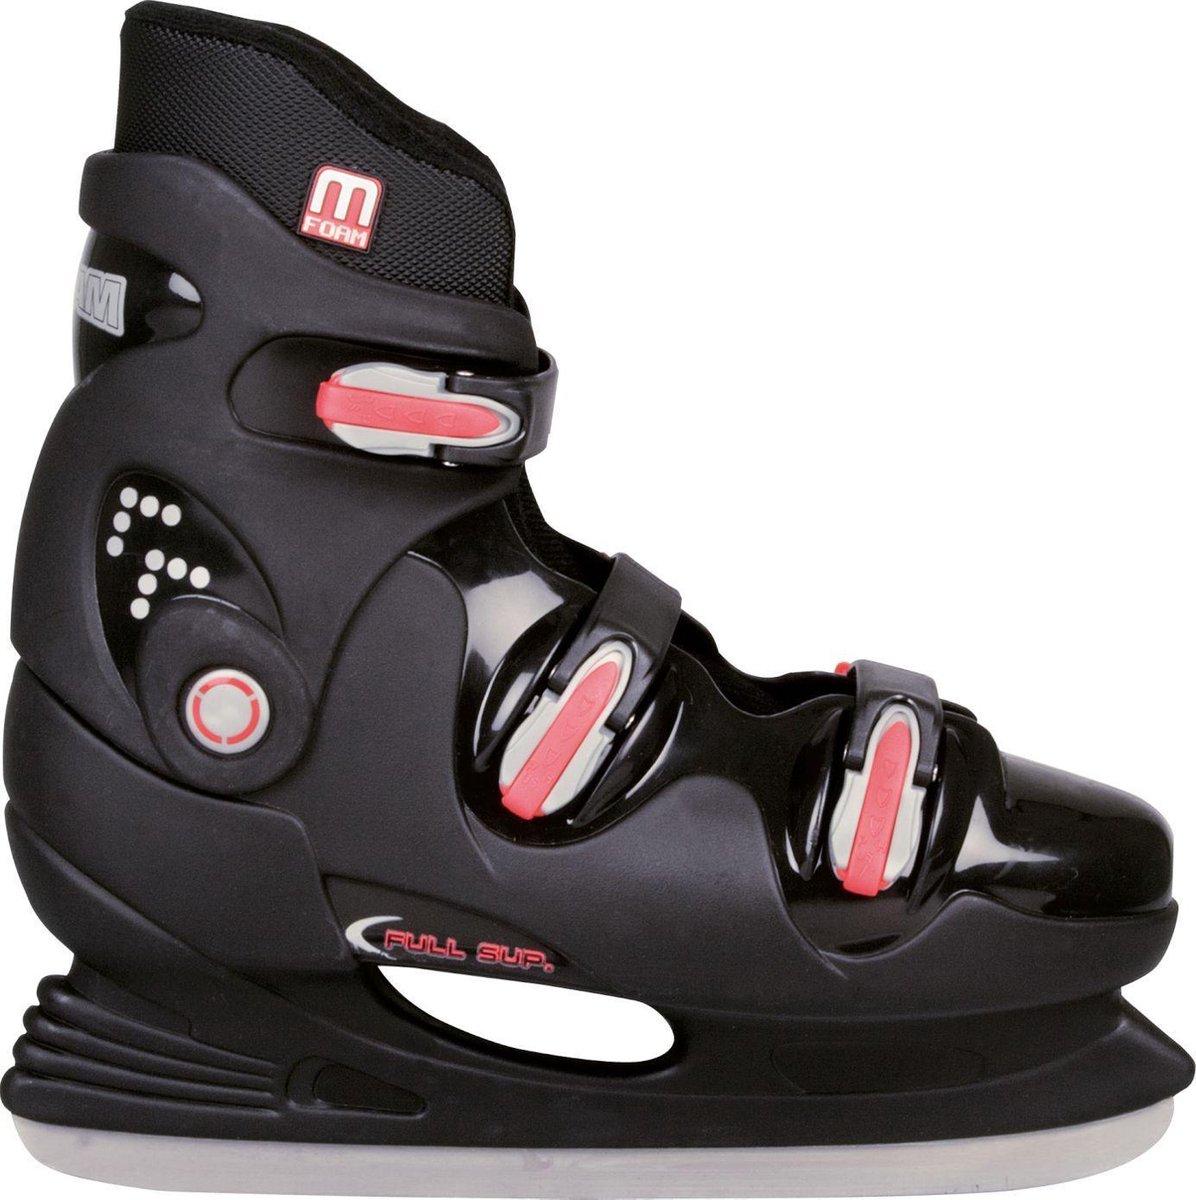 Nijdam IJshockeyschaats - Hardboot - Zwart/Zilver/Rood - 44